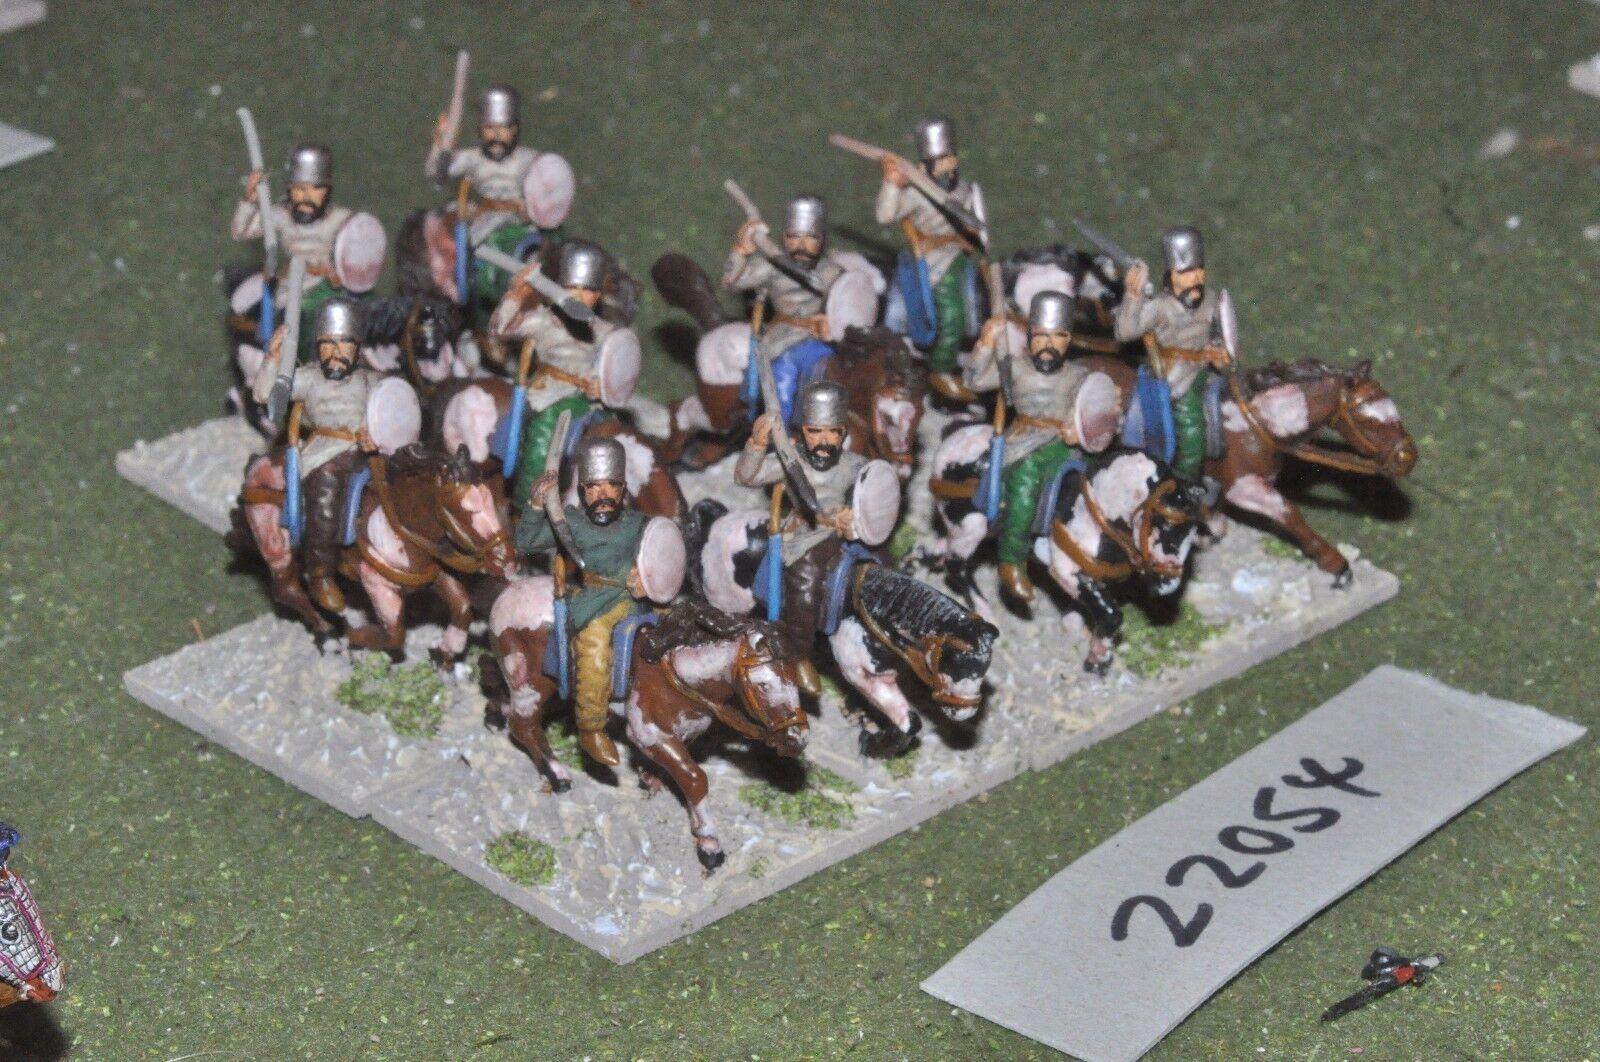 25mm roman era   sassanid - persian horse archers 10 figs cavalry - cav (22054)